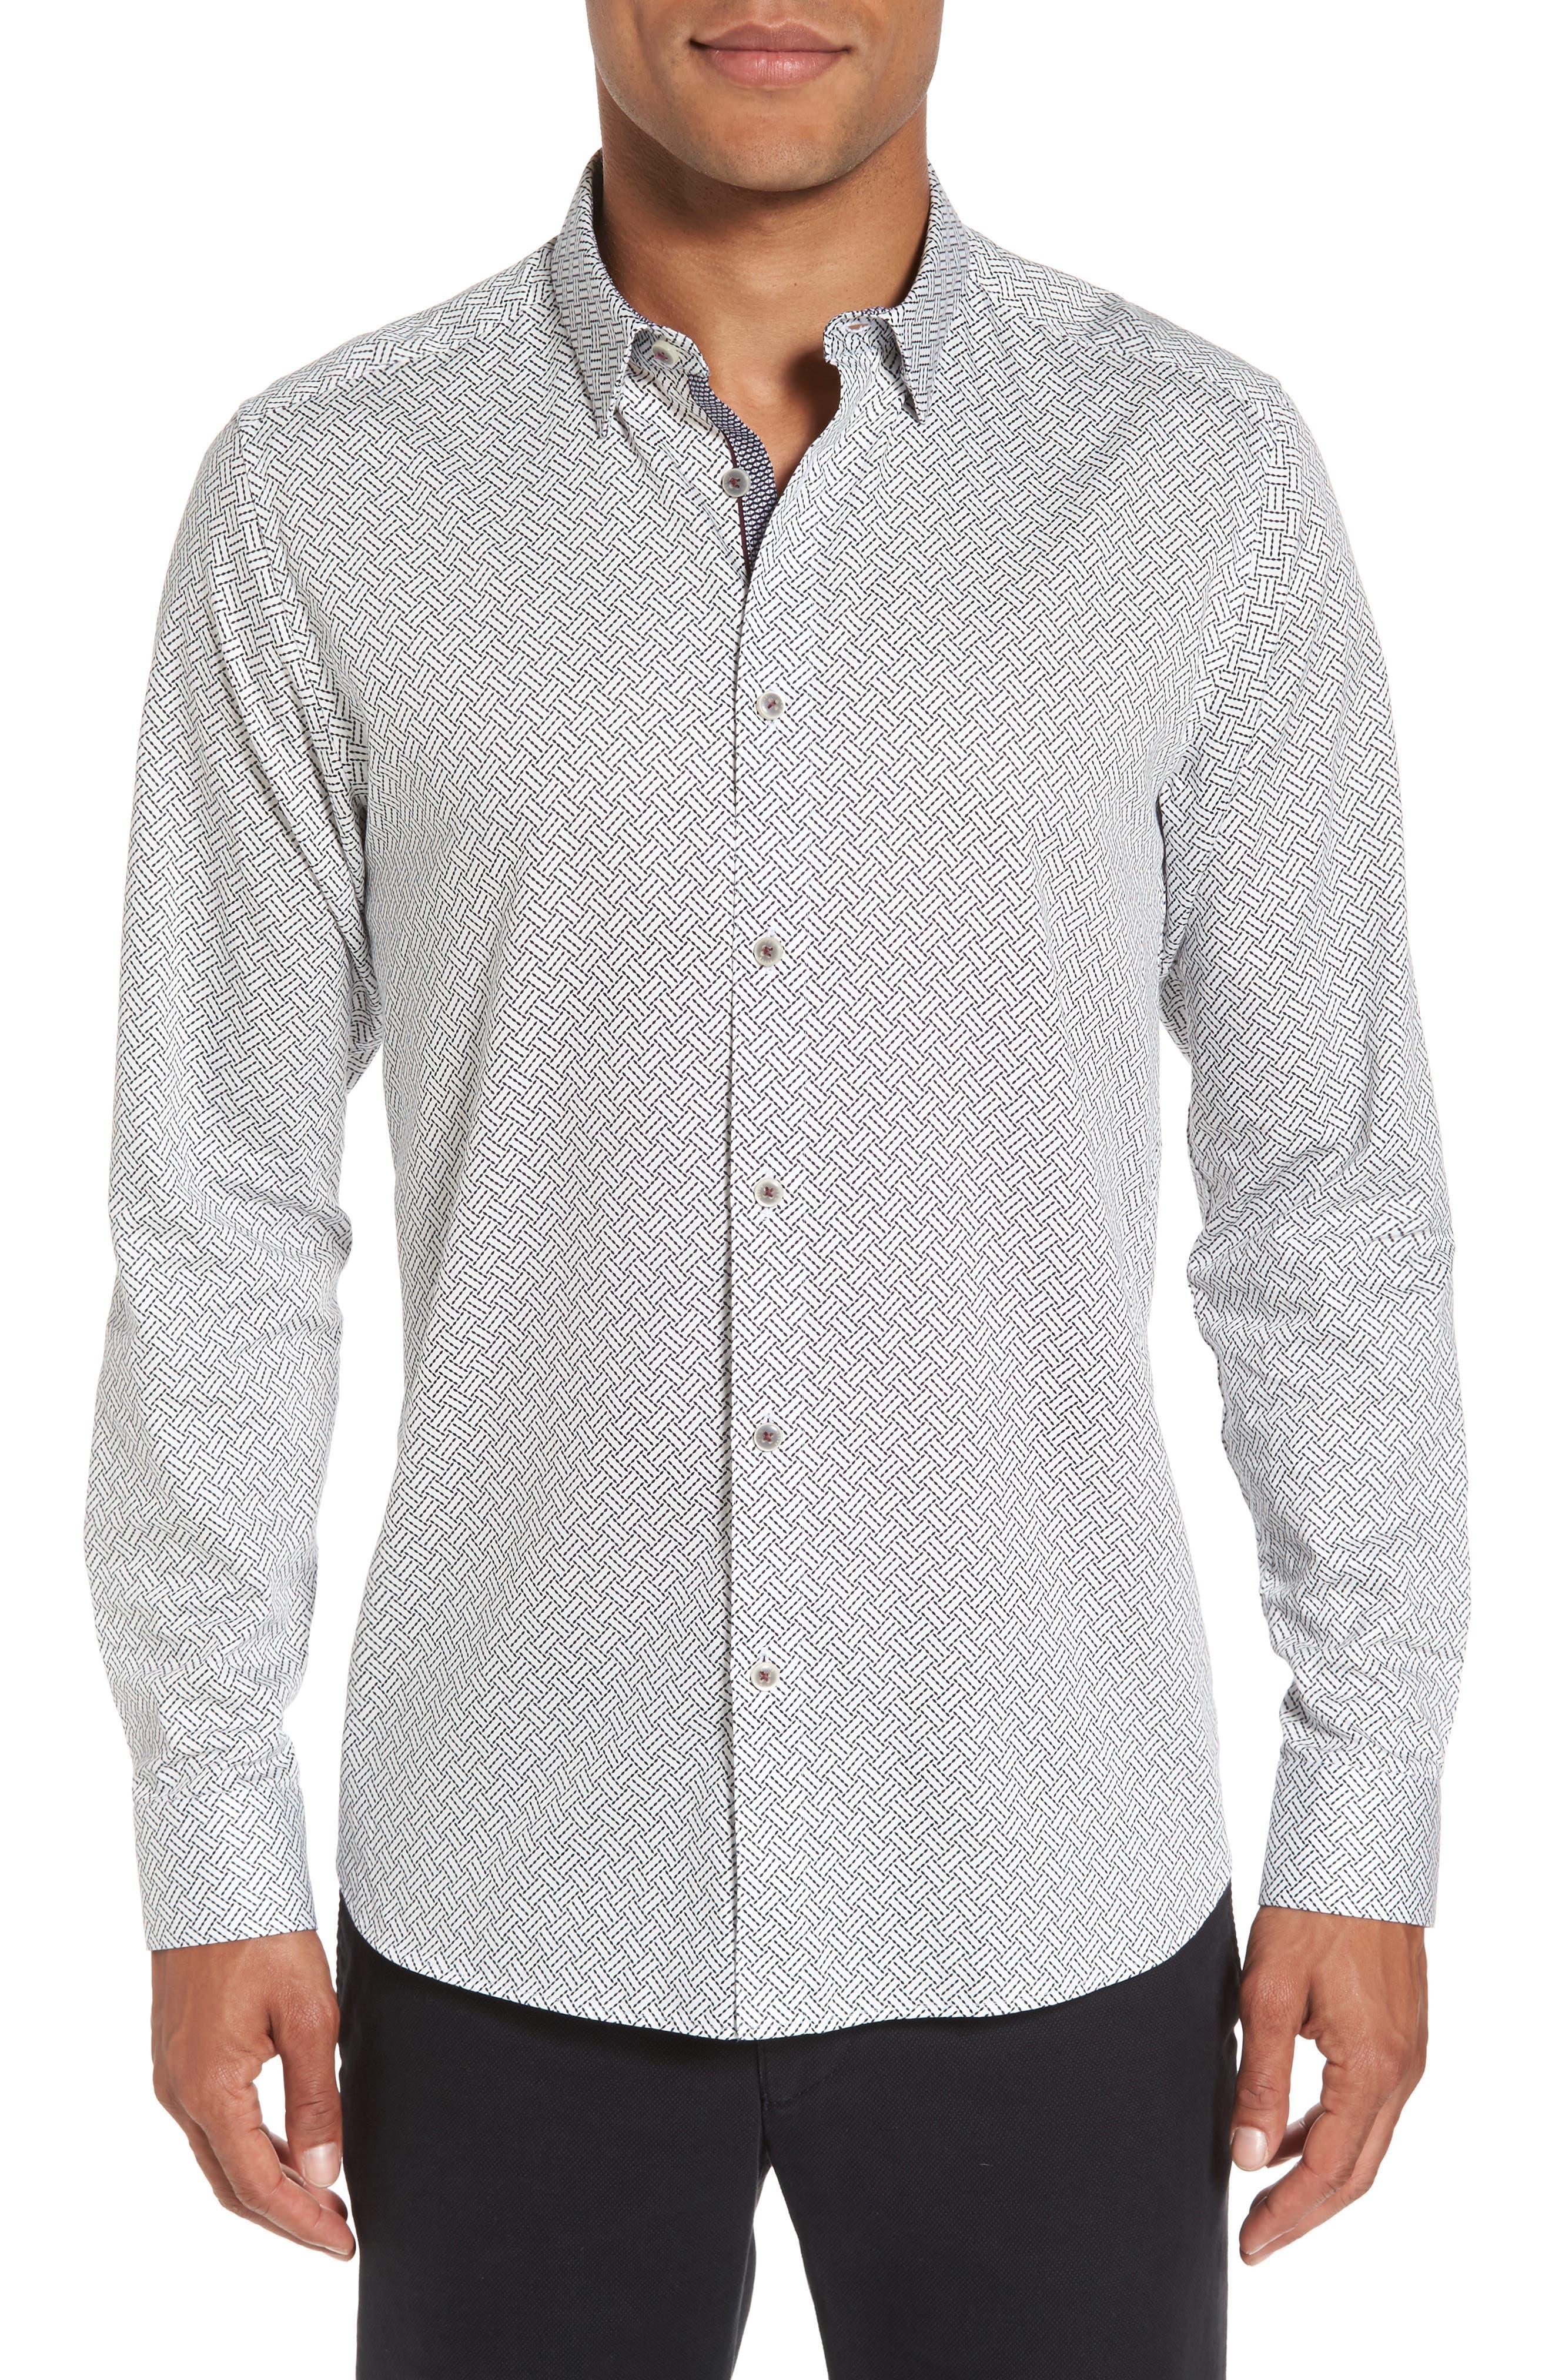 Larosh Slim Fit Basket Weave Print Sport Shirt,                             Main thumbnail 1, color,                             110